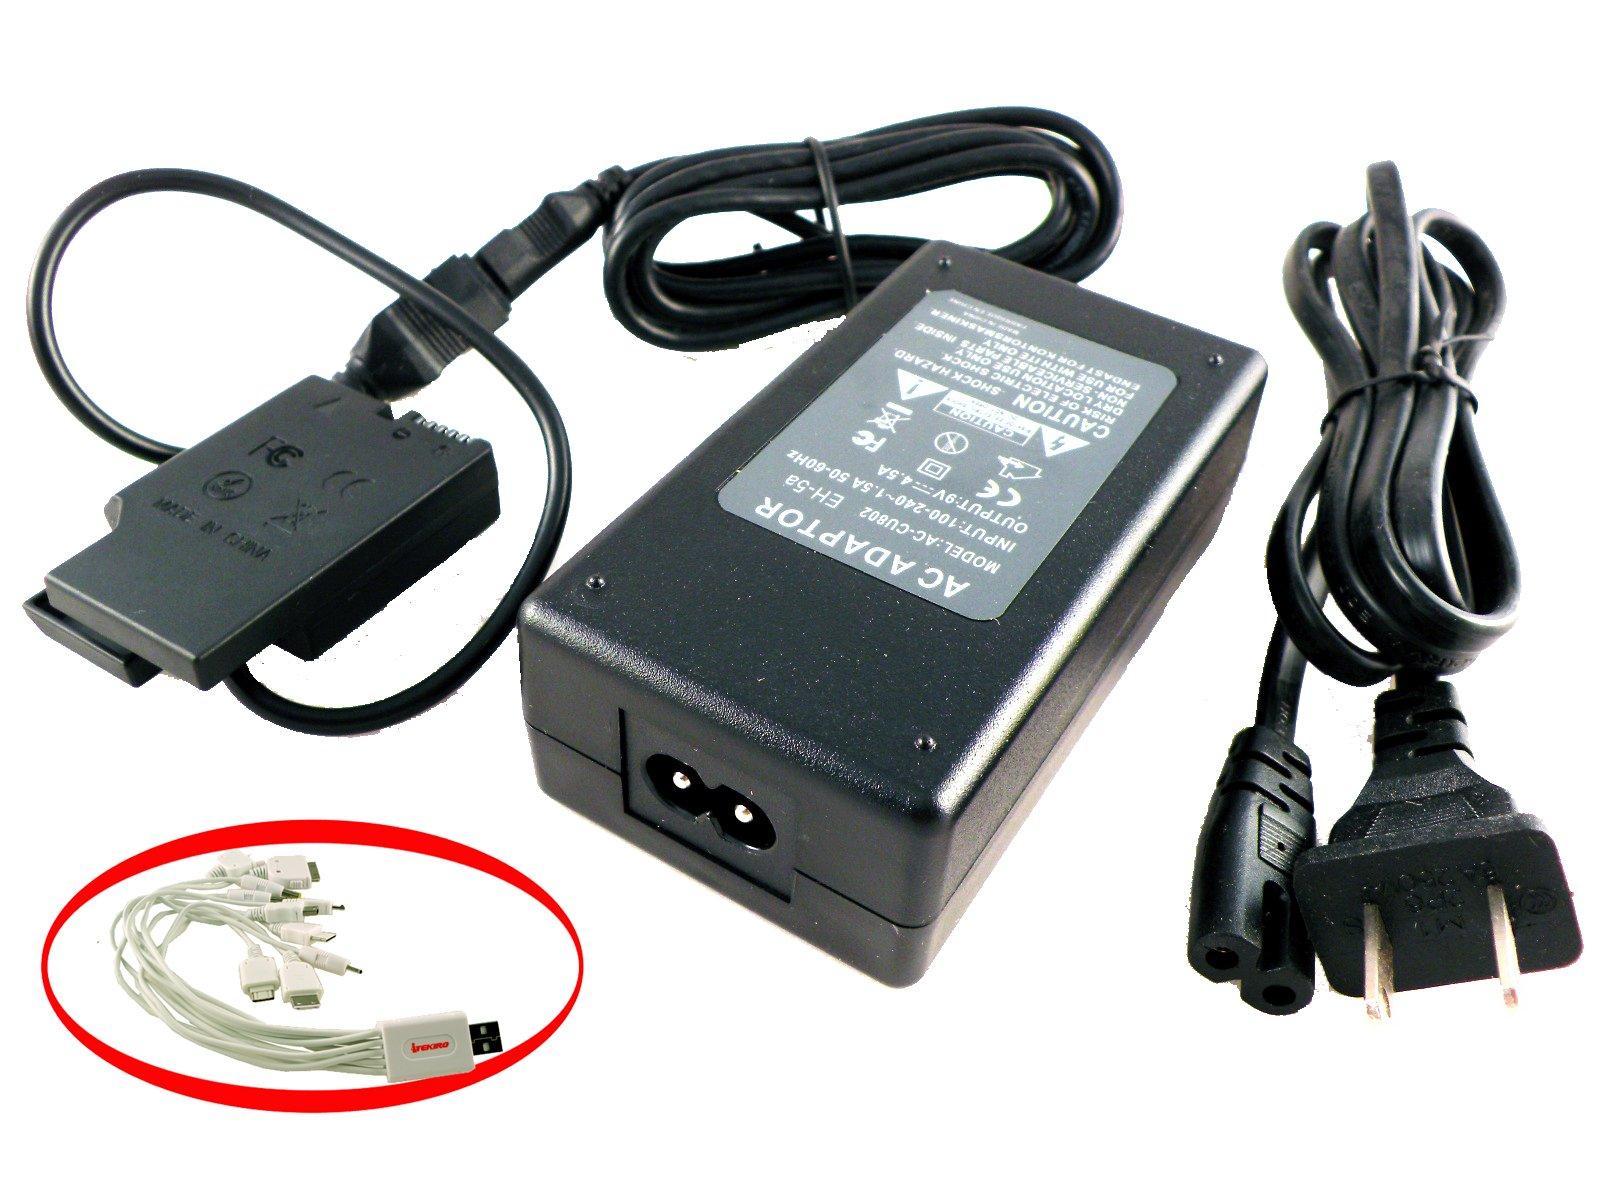 D810 D750 D800 D800E D7100 D600 1 V1 Digital Cameras Polaroid AC Power Adapter Kit For Nikon D7000 D610 Nikon EH5 + EP5B Replacement